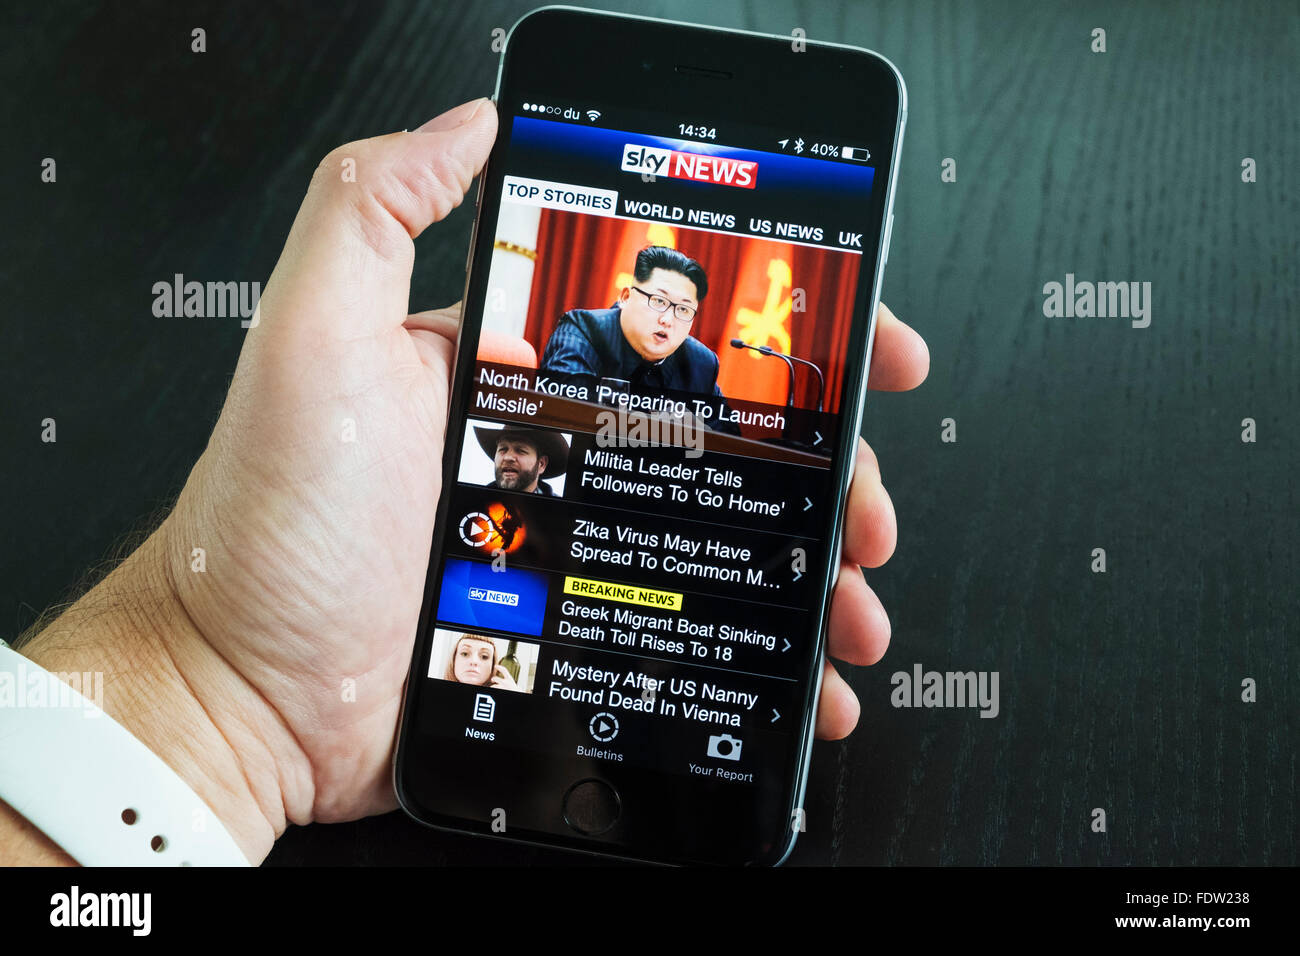 4f349947b6346d SKY news online news app on iPhone 6 plus smart phone Stock Photo ...